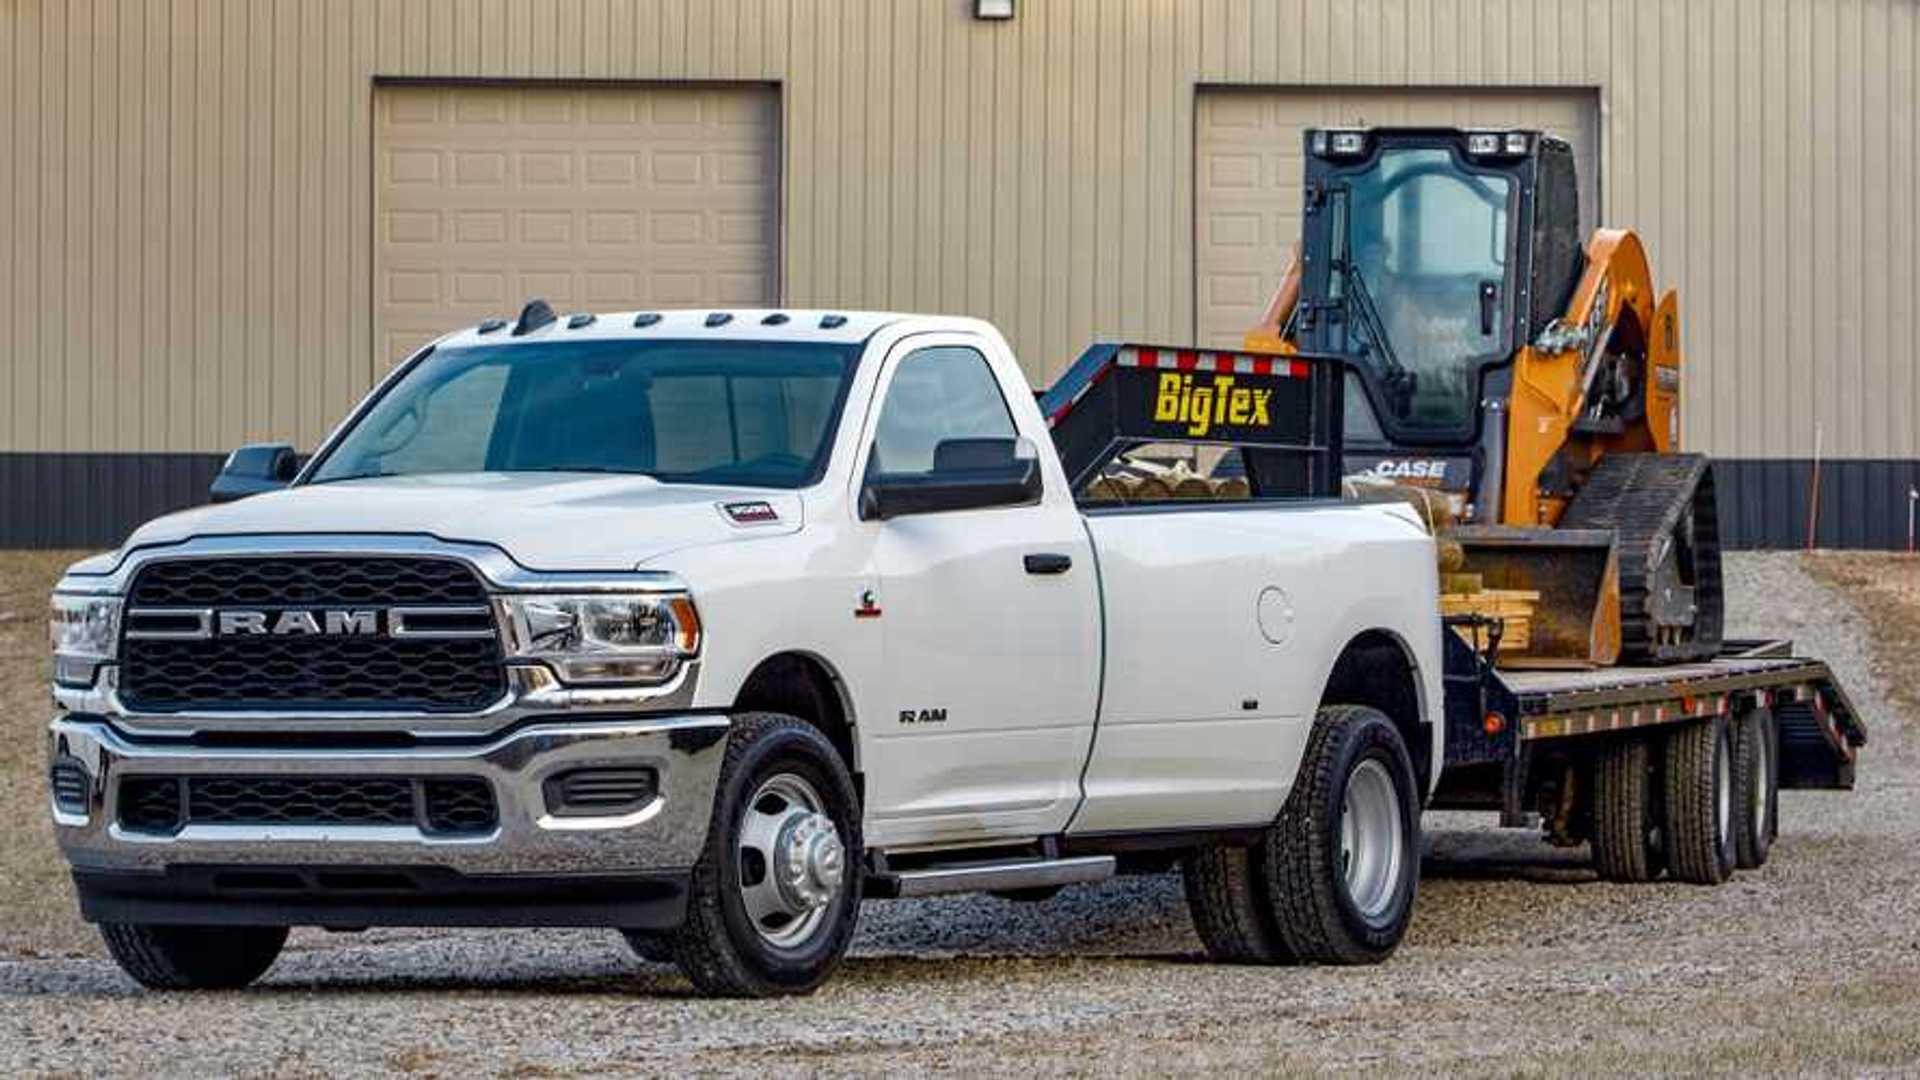 2019 Ram 3500 Tradesman Arrives With 1,000 Lb-Ft, Crank Windows